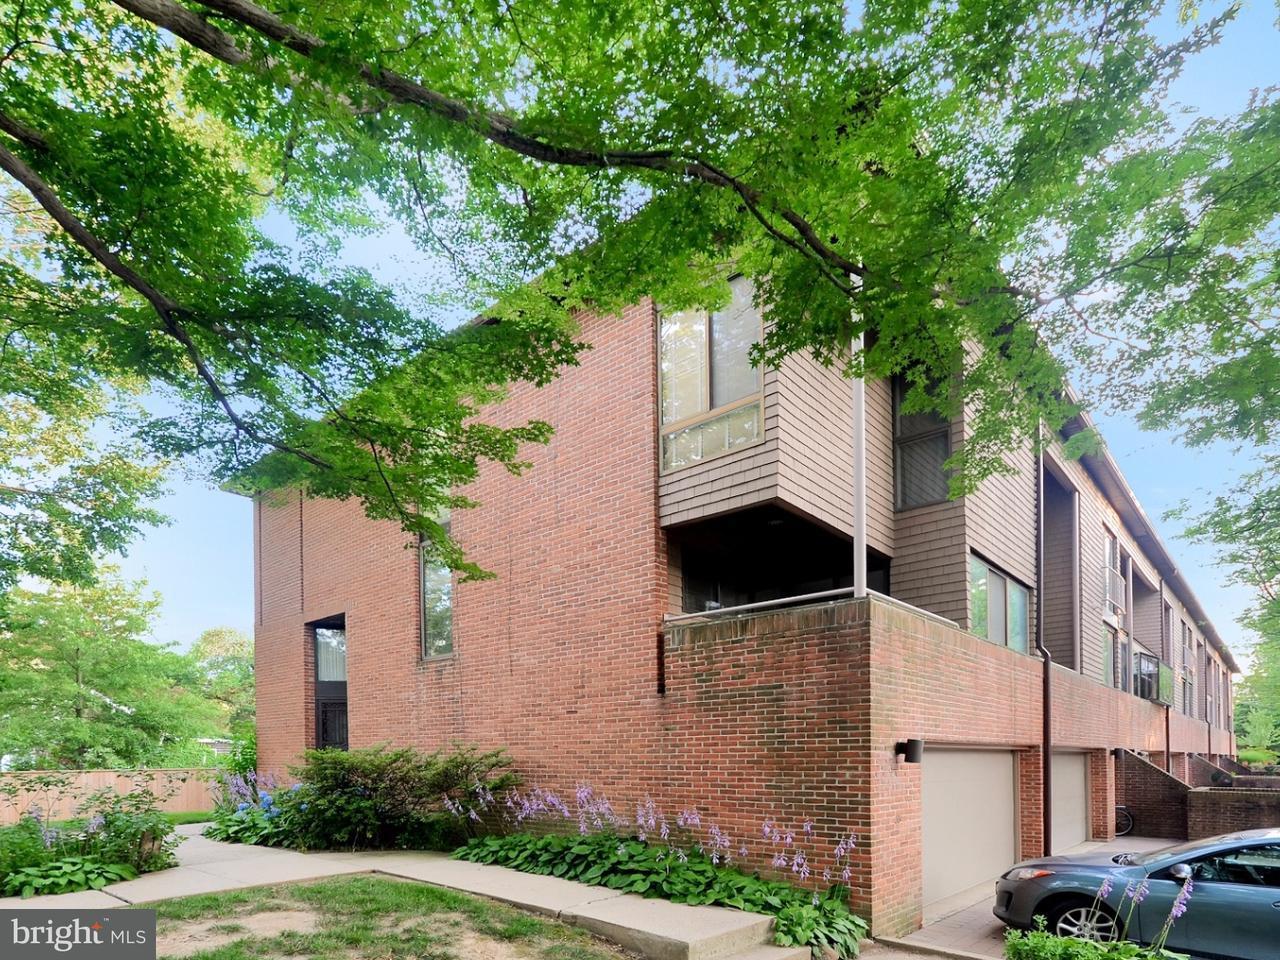 Townhouse for Sale at 35 SERGEANT Street Princeton, New Jersey 08540 United StatesMunicipality: Princeton